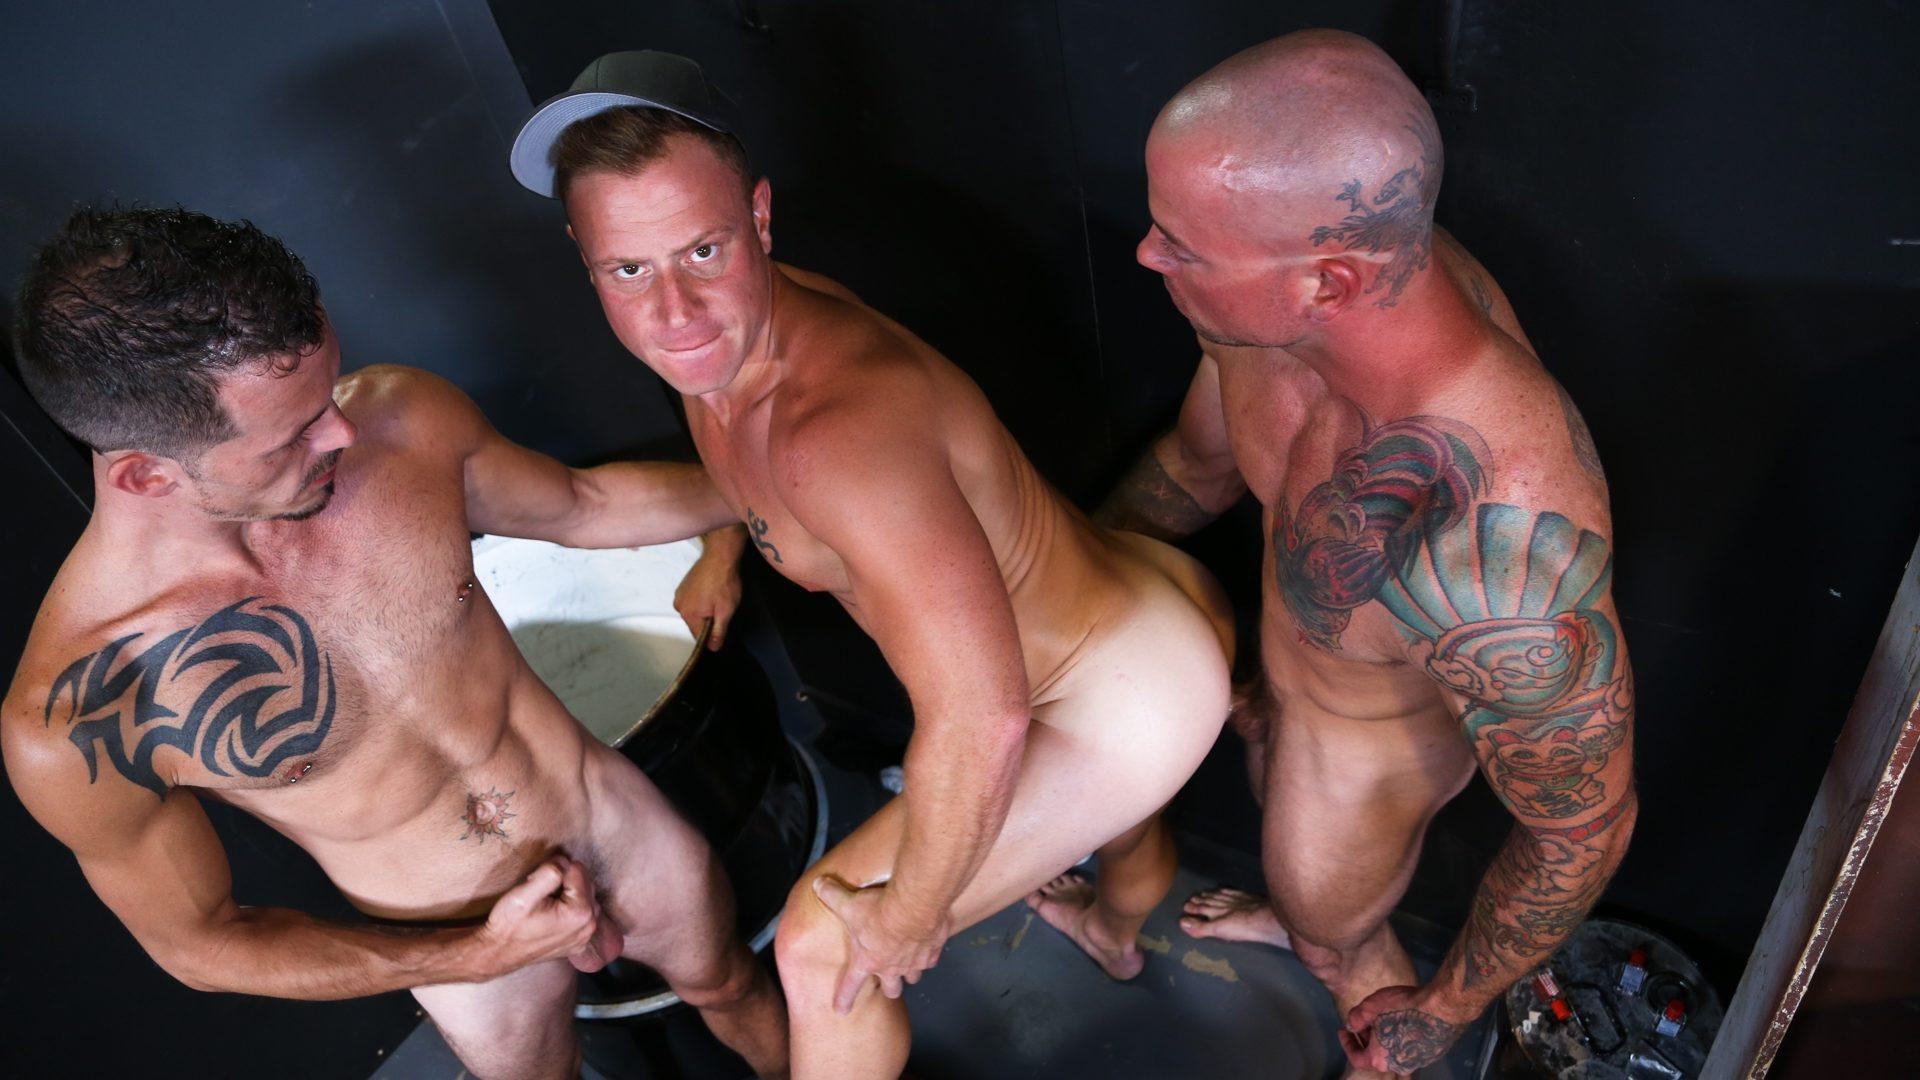 Sean Duran, Jimmie Slater and Saxon West